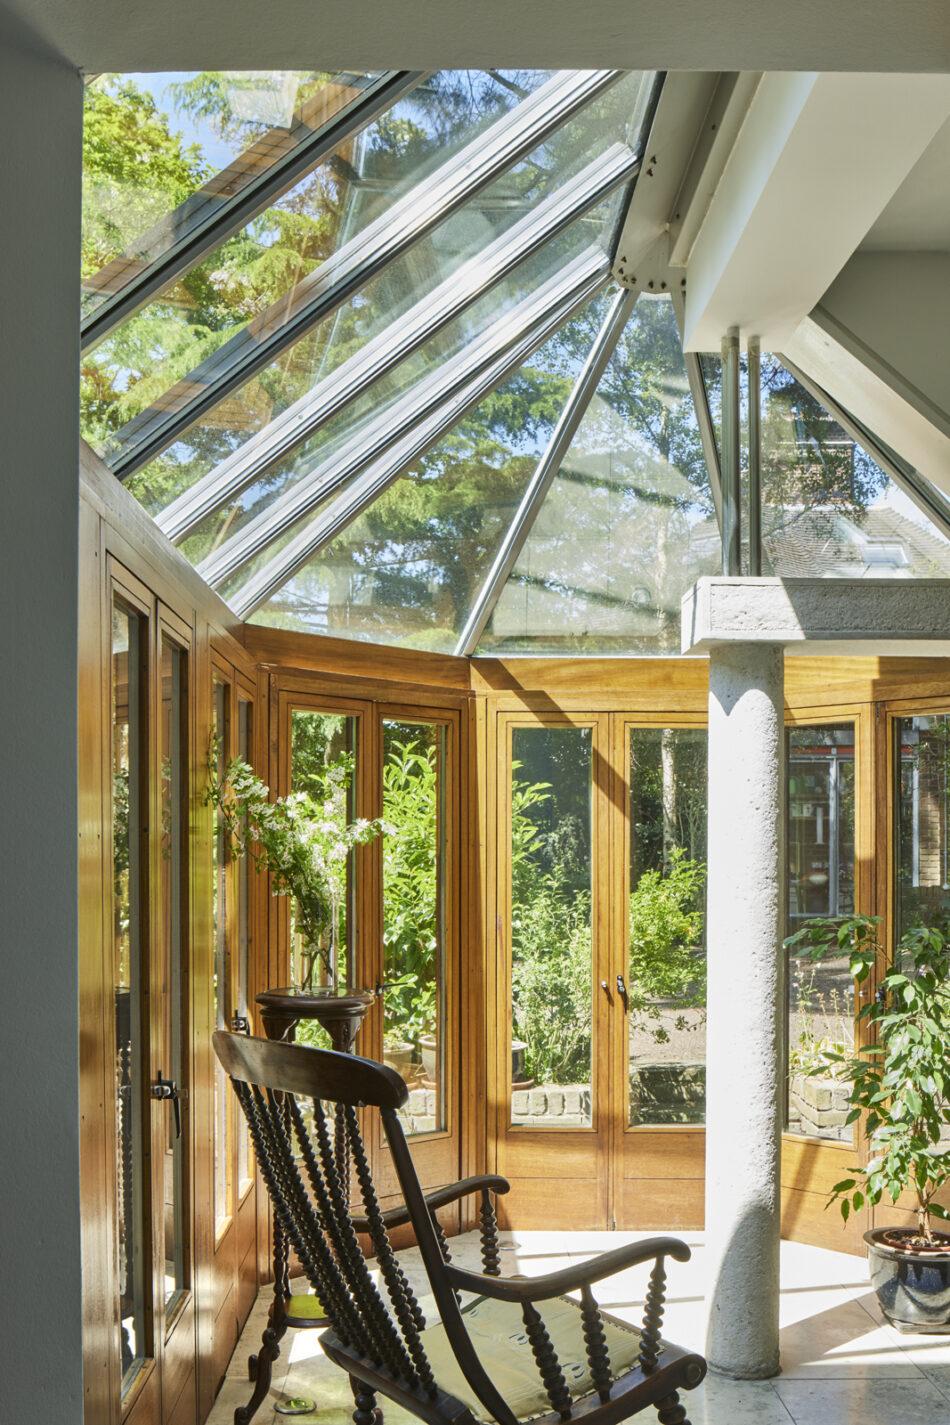 Apex-Lodge-Fitzroy-Park-London-N6-14-950x1425.jpg